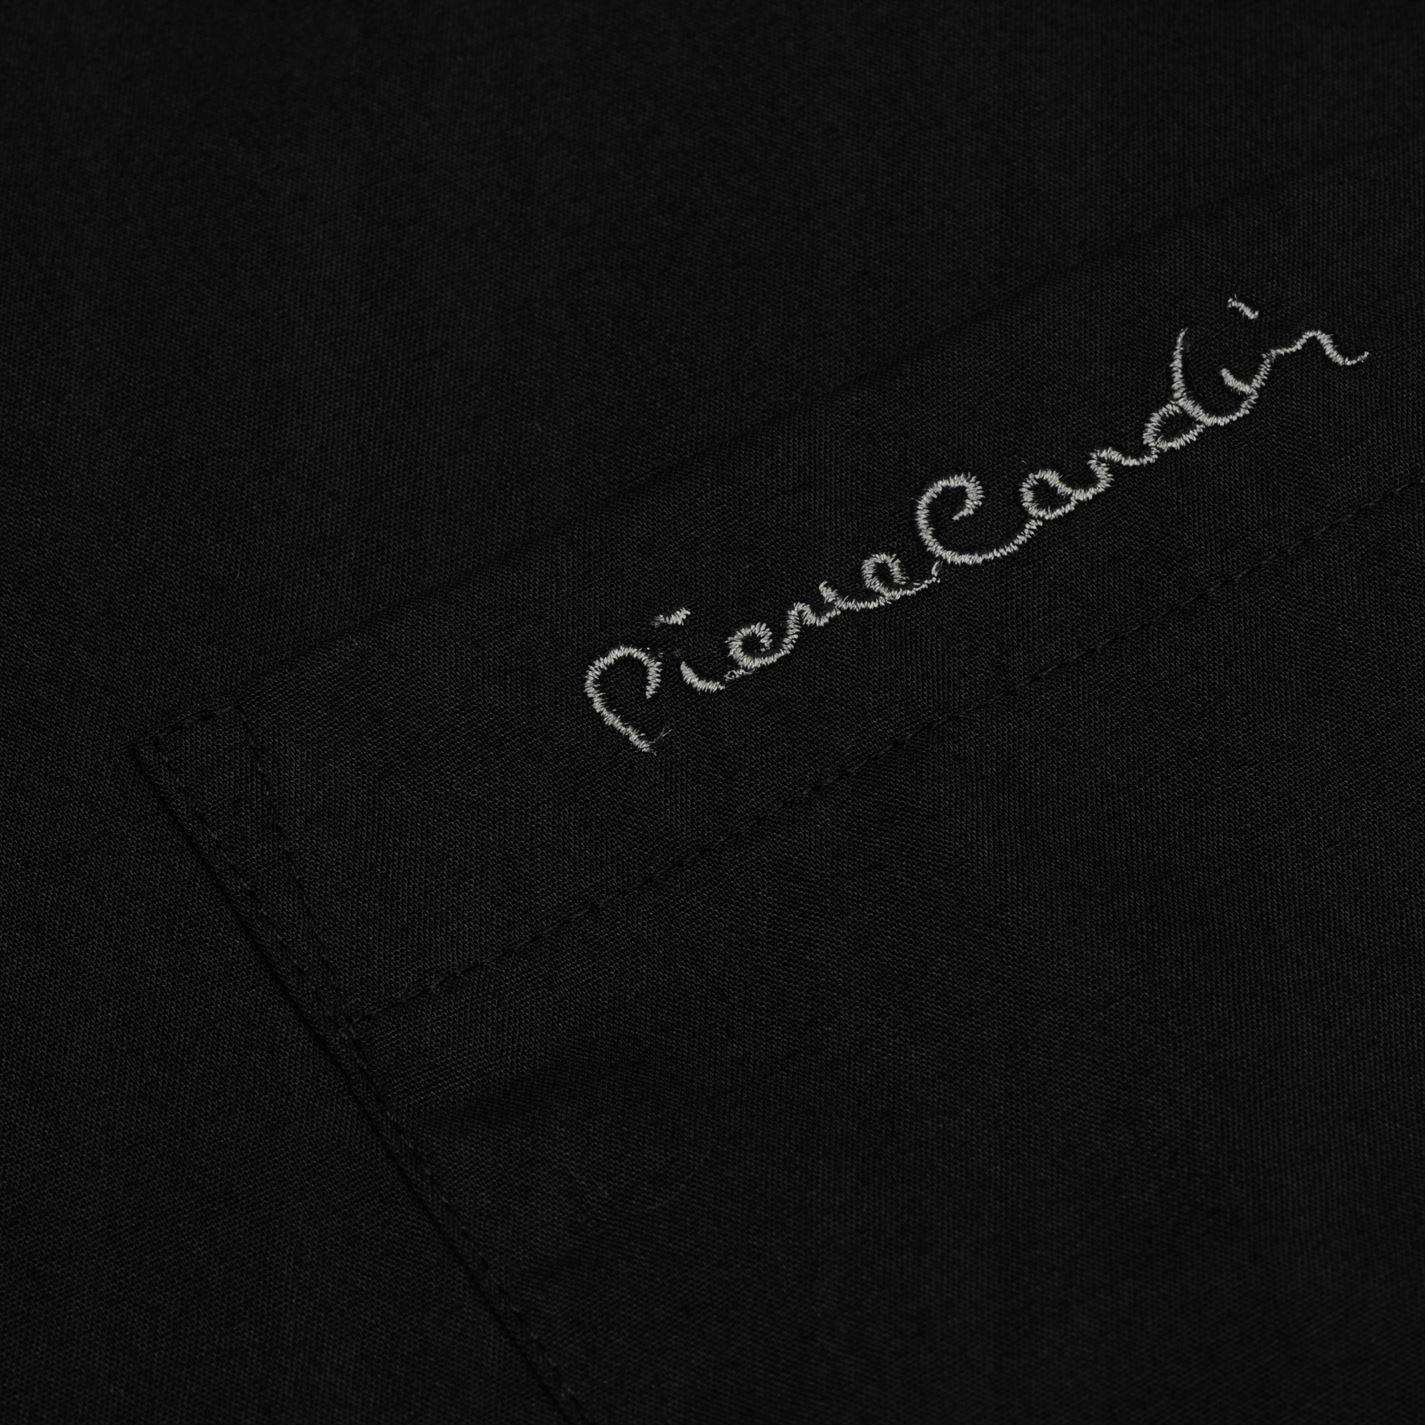 Elegancka koszula Pierre Cardin DUŻA tu XXXL 3XL 9169530349 iEjLTNEu